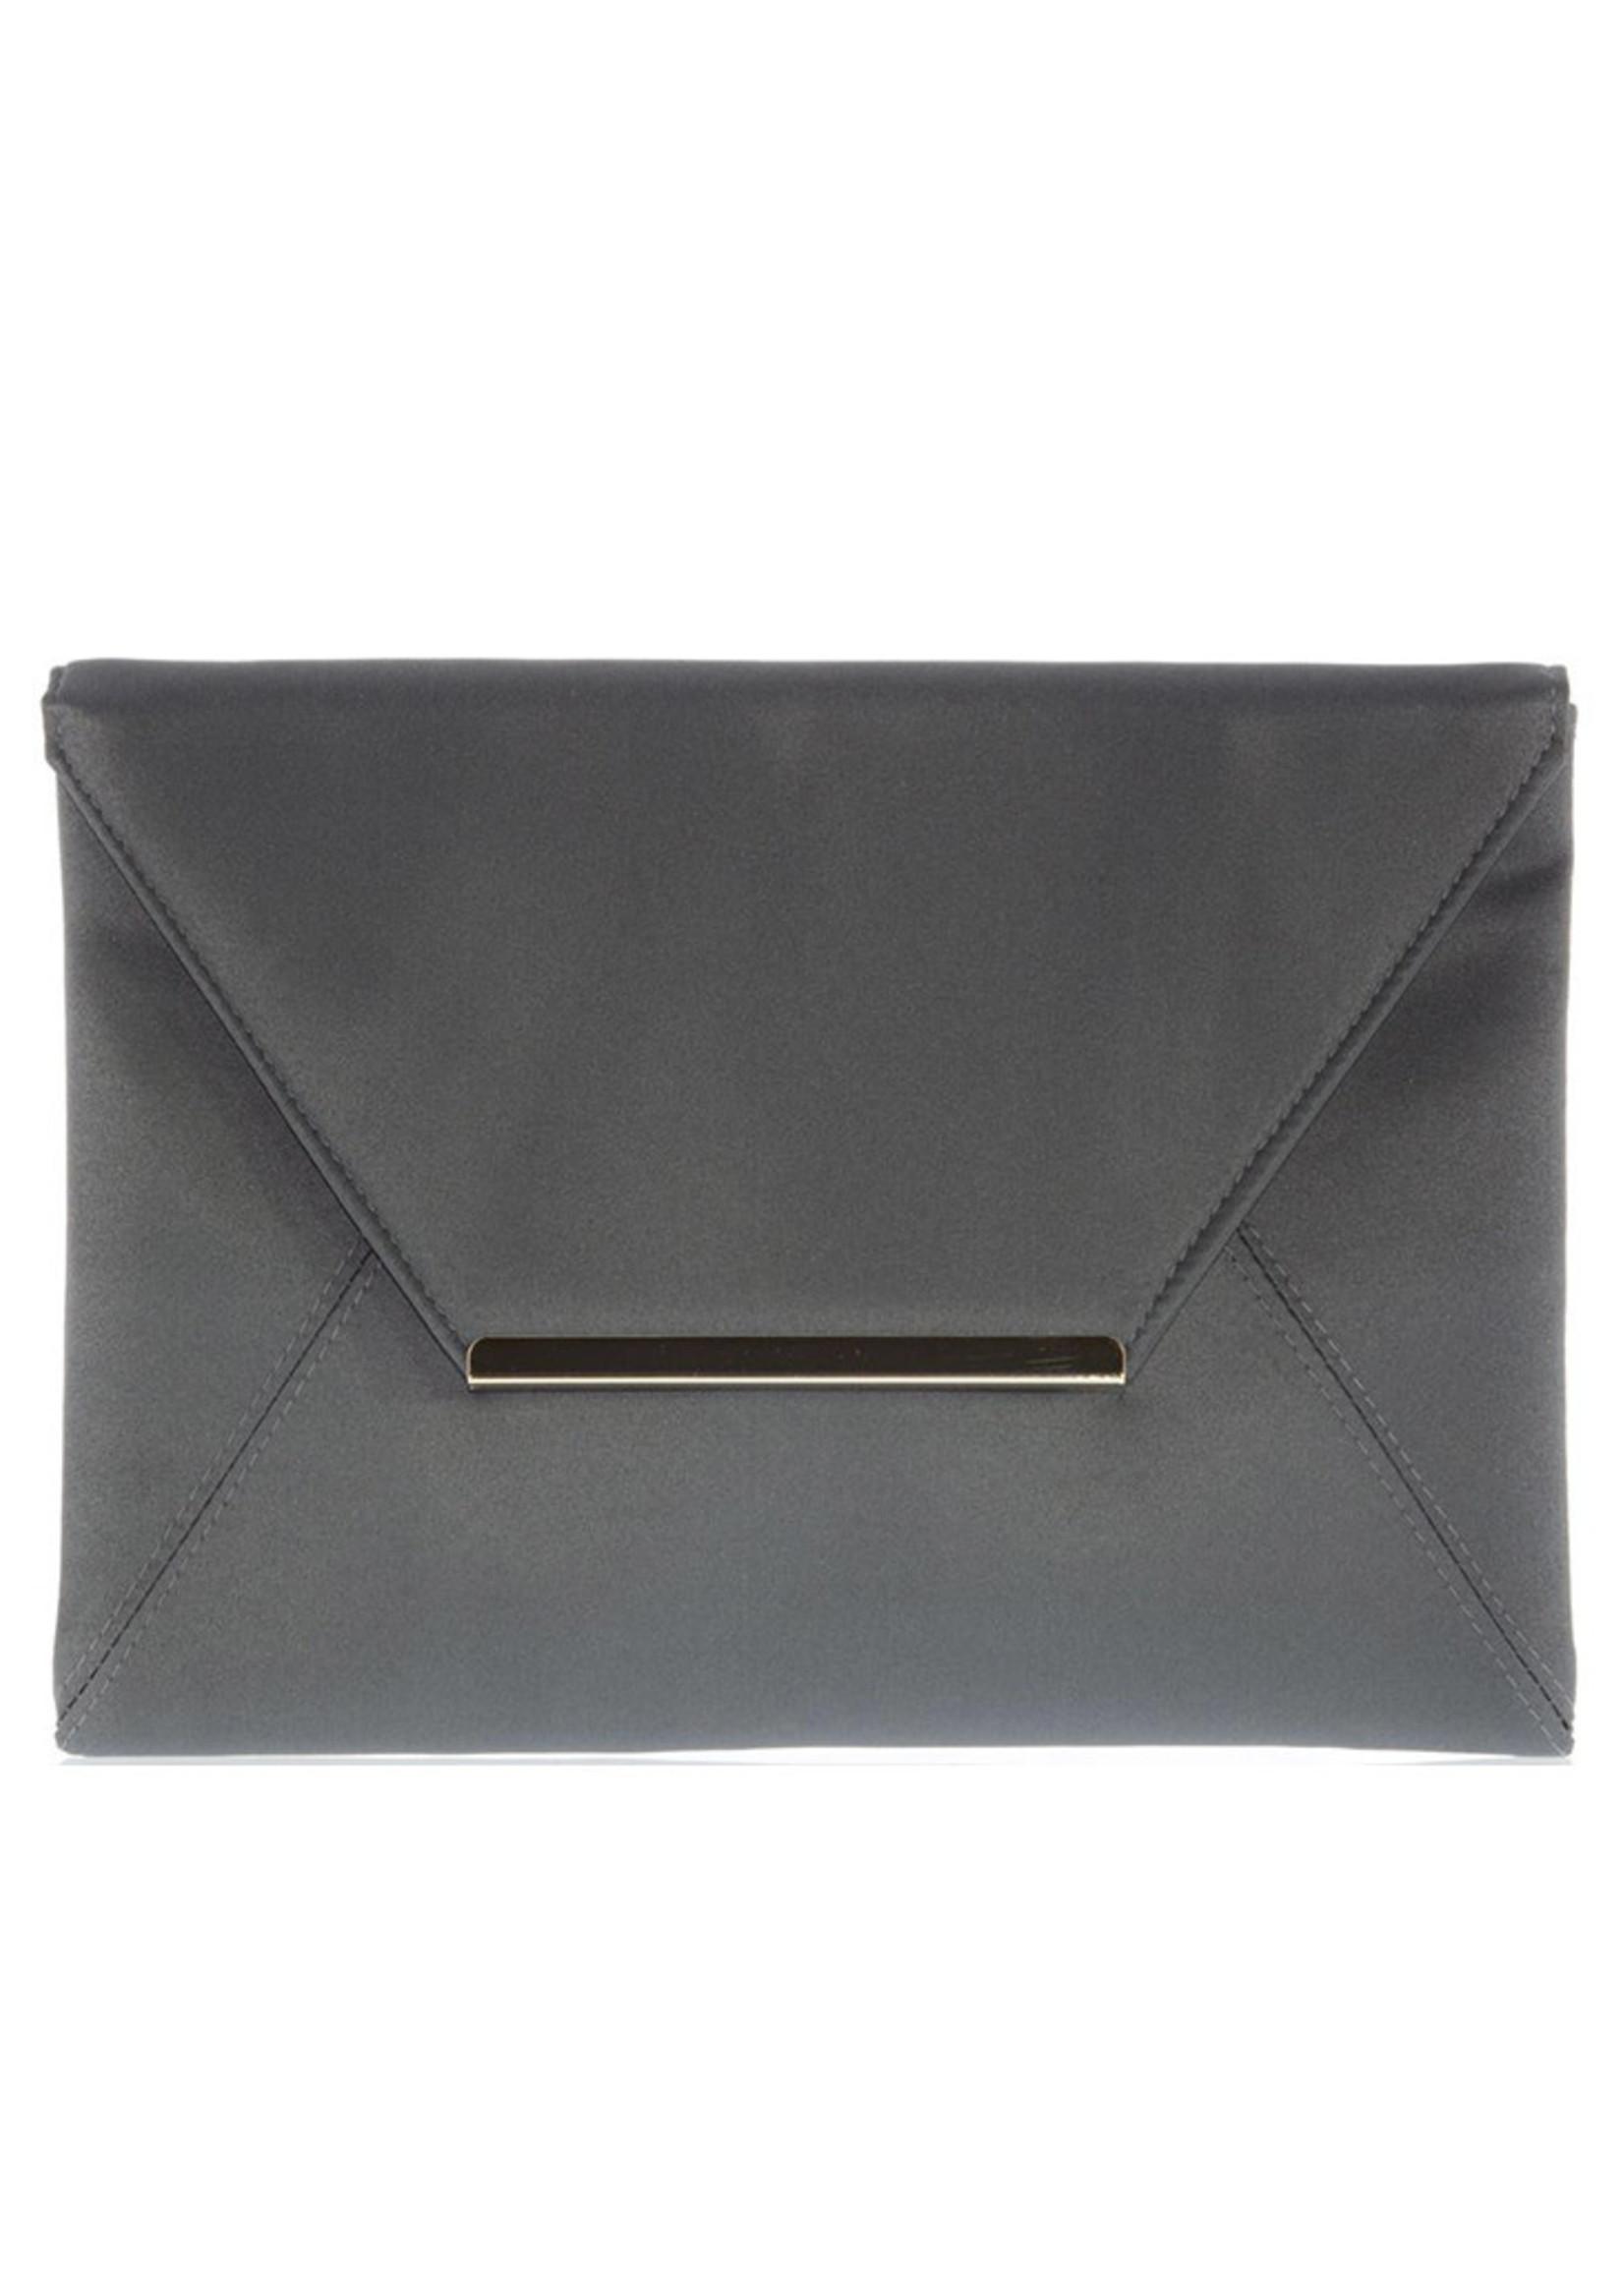 Gabee Products Amy Matt Satin Envelope Clutch - Steel